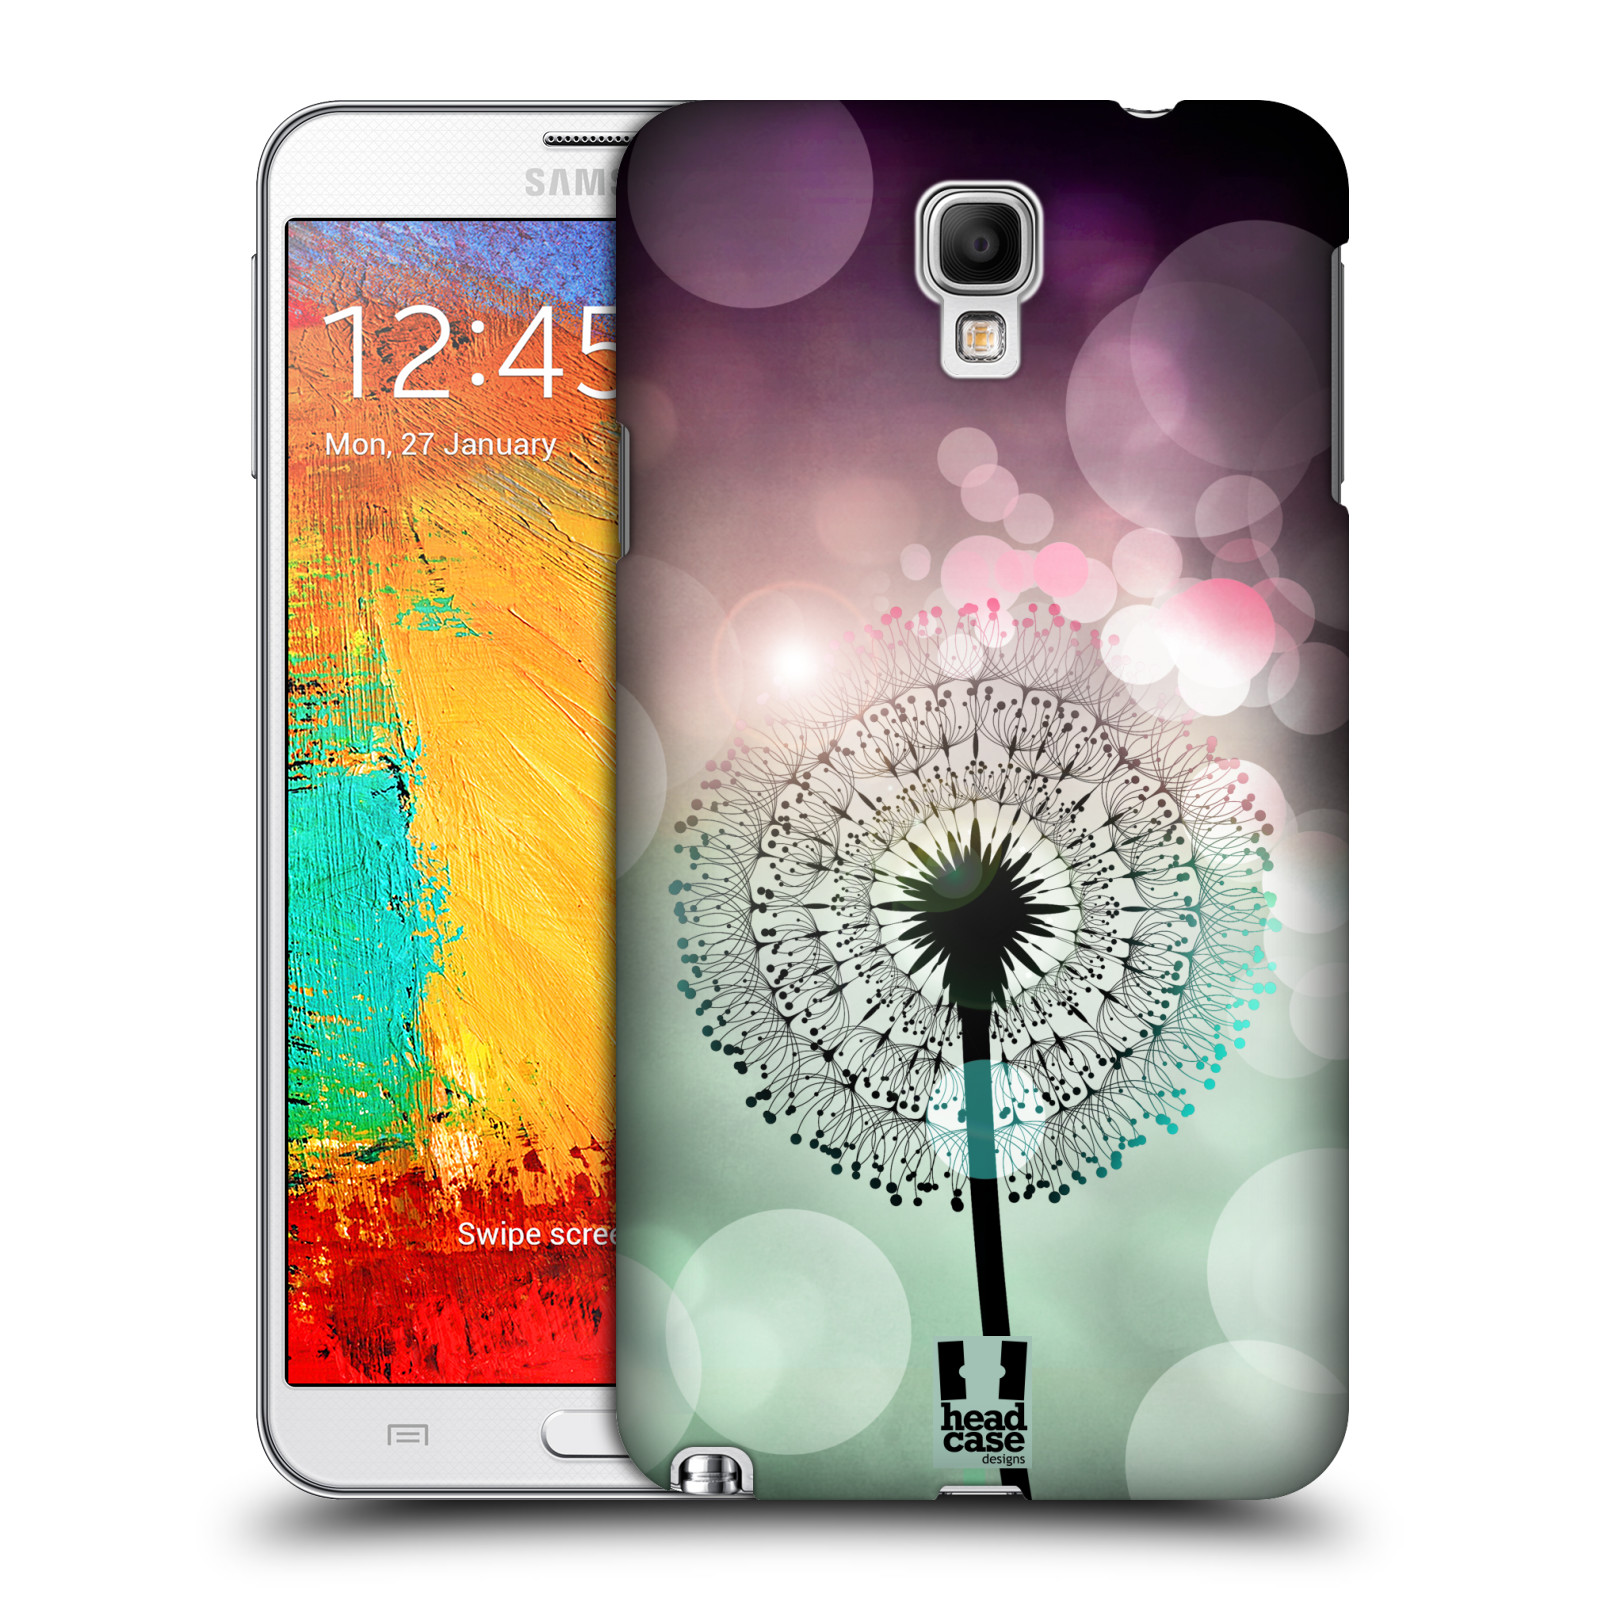 Plastové pouzdro na mobil Samsung Galaxy Note 3 Neo HEAD CASE Pampeliškové odlesky (Kryt či obal na mobilní telefon Samsung Galaxy Note 3 Neo SM-N7505)